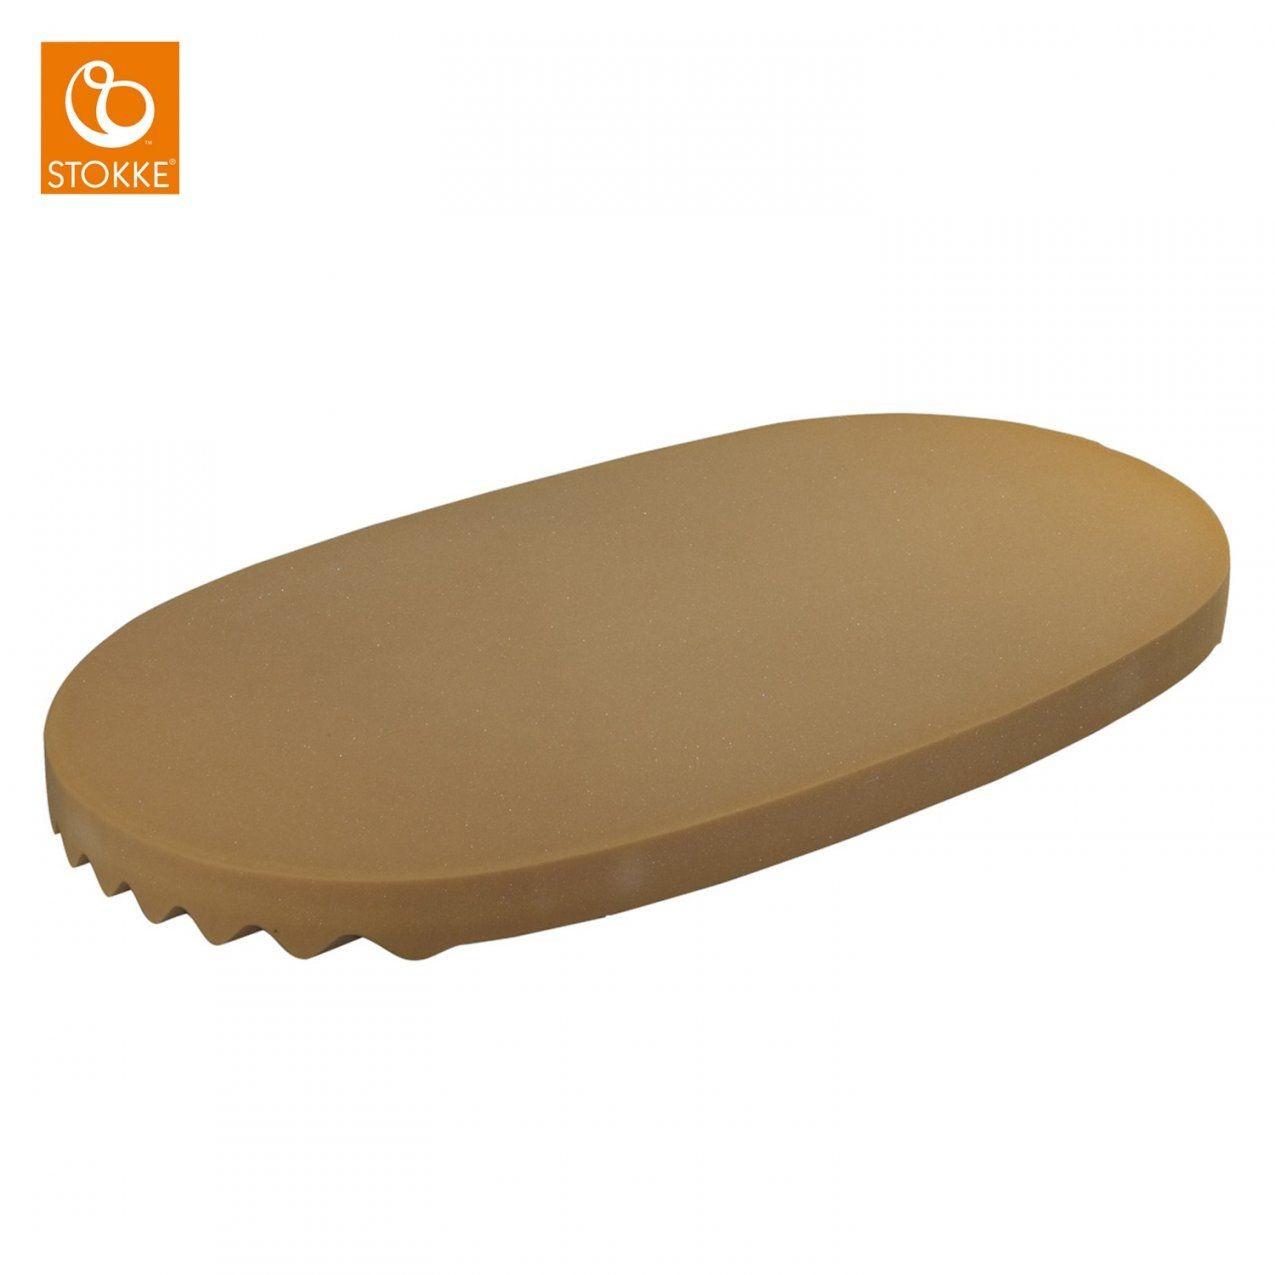 Stokke Umbausatz Junior Bett Natural + Matratze von Stokke Sleepi Junior Matratze Bild